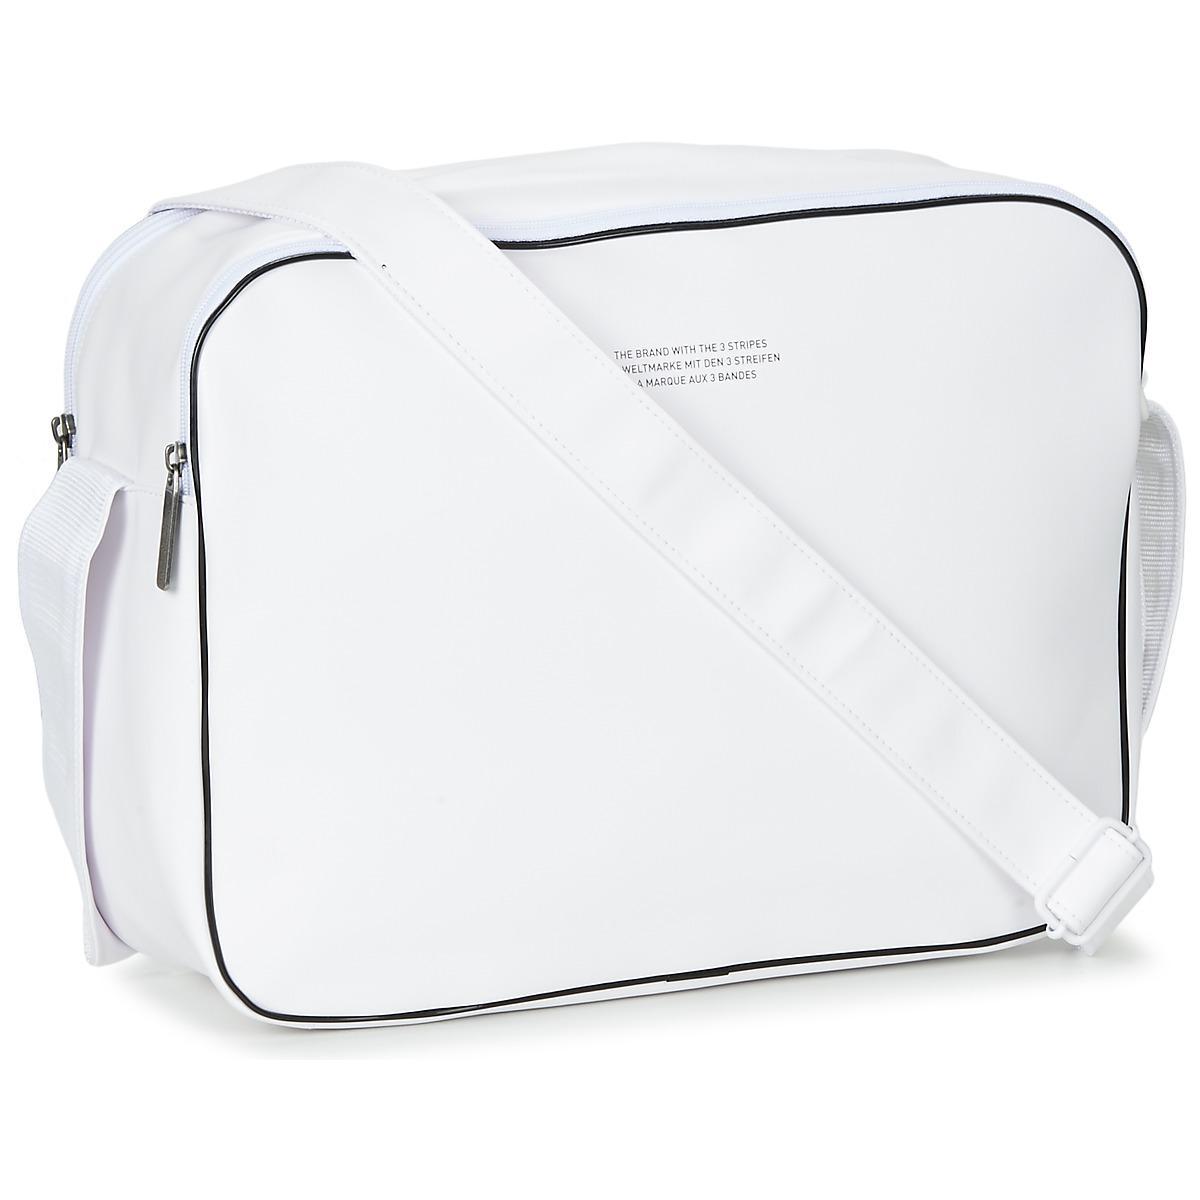 6dfecb6c3358 adidas Airliner Vintage Men s Messenger Bag In White in White for ...